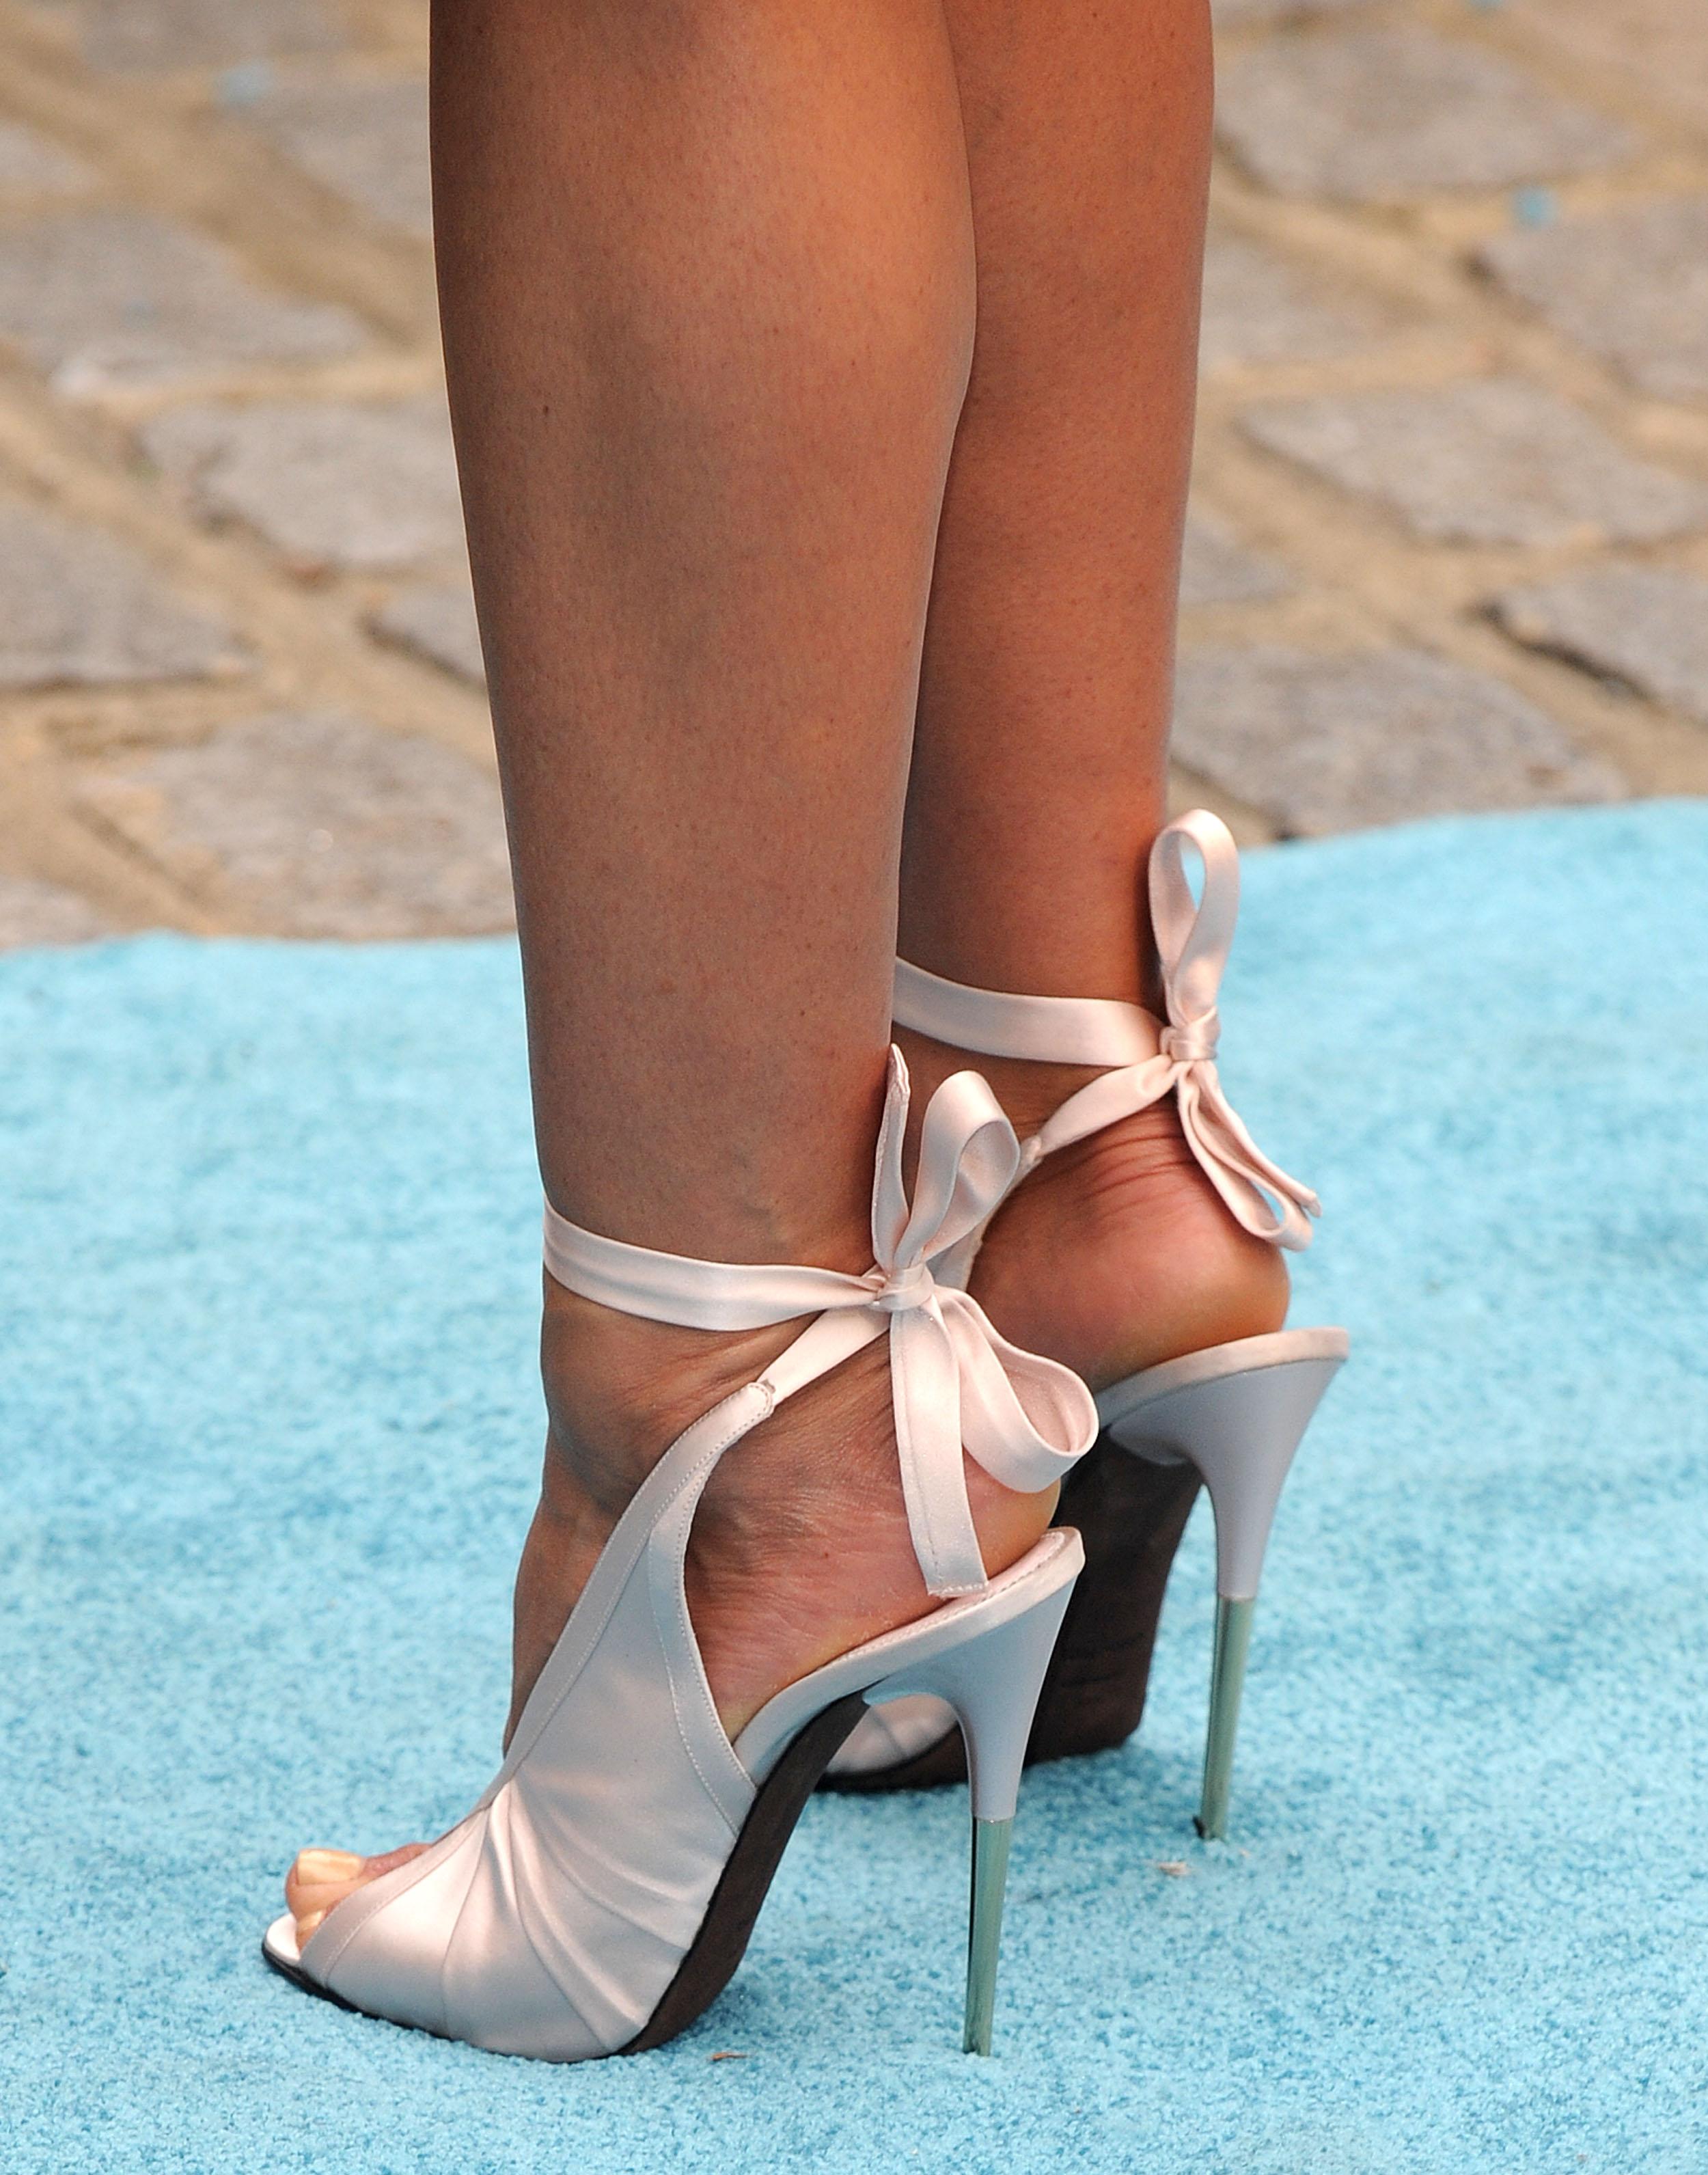 Especial jeniffer aniston p s famosos - Jennifer aniston barefoot ...